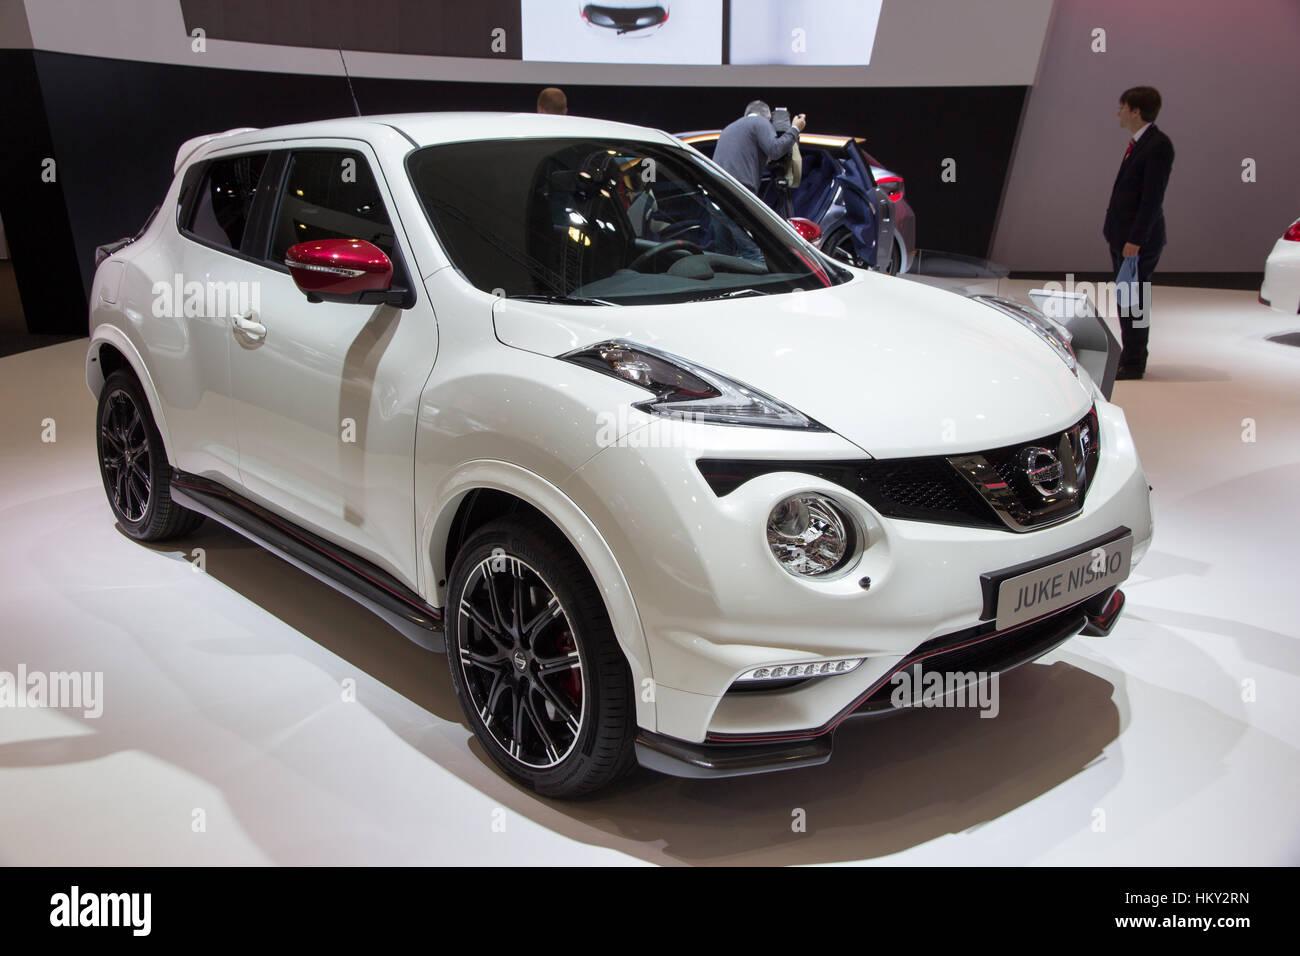 BRUSSELS   JAN 12, 2016: Nissan Juke Nismo On Display At The Brussels Motor